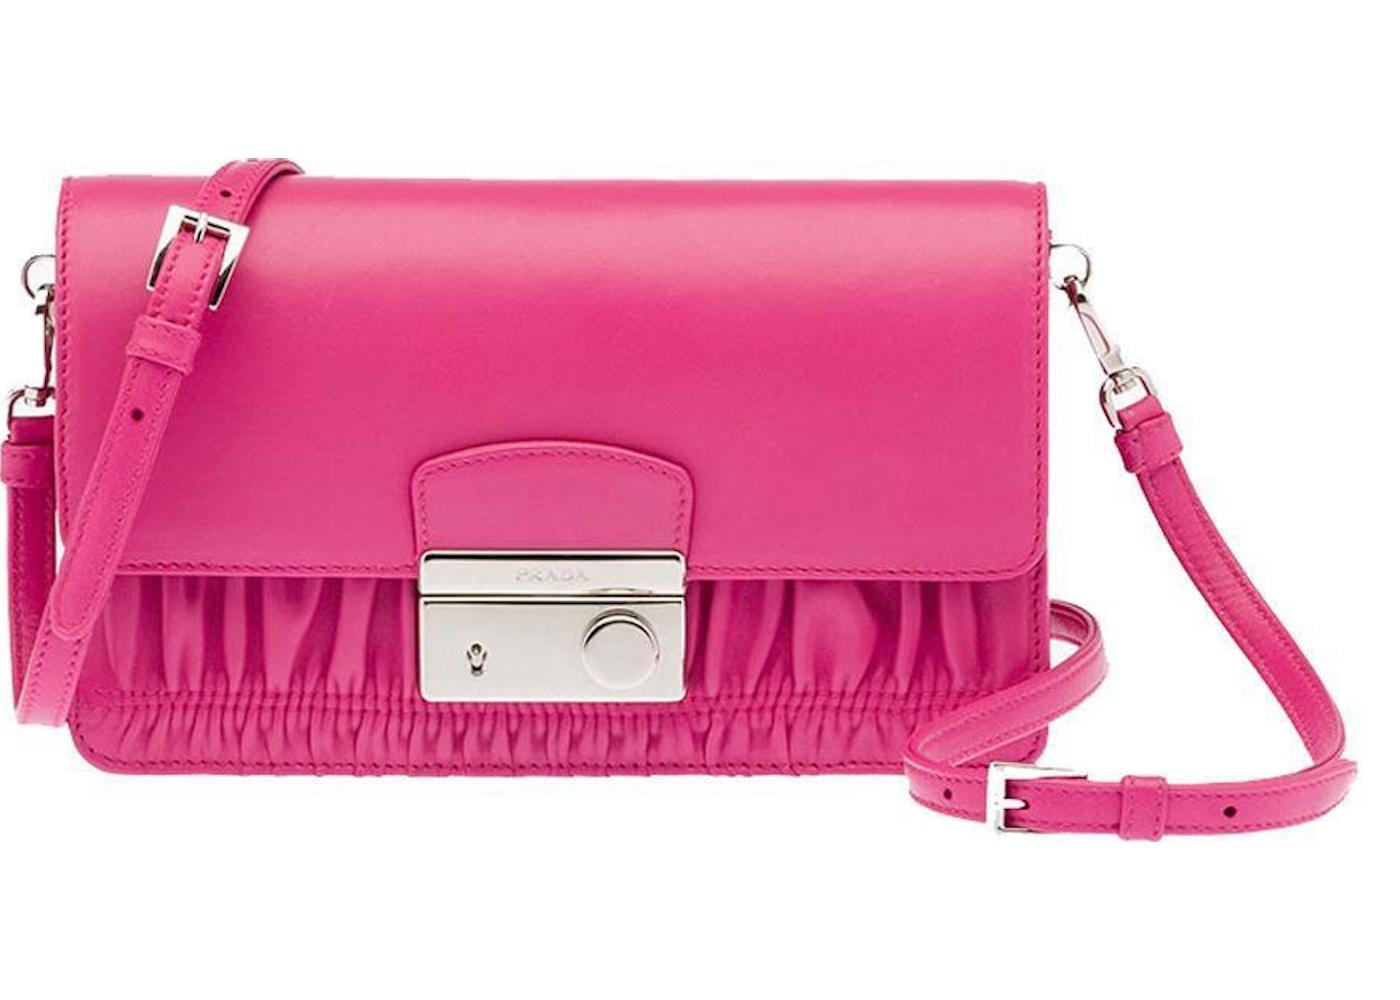 60e8d048b62b Sell. or Ask. View All Bids. Prada Nappa Gaufre Clutch Pink